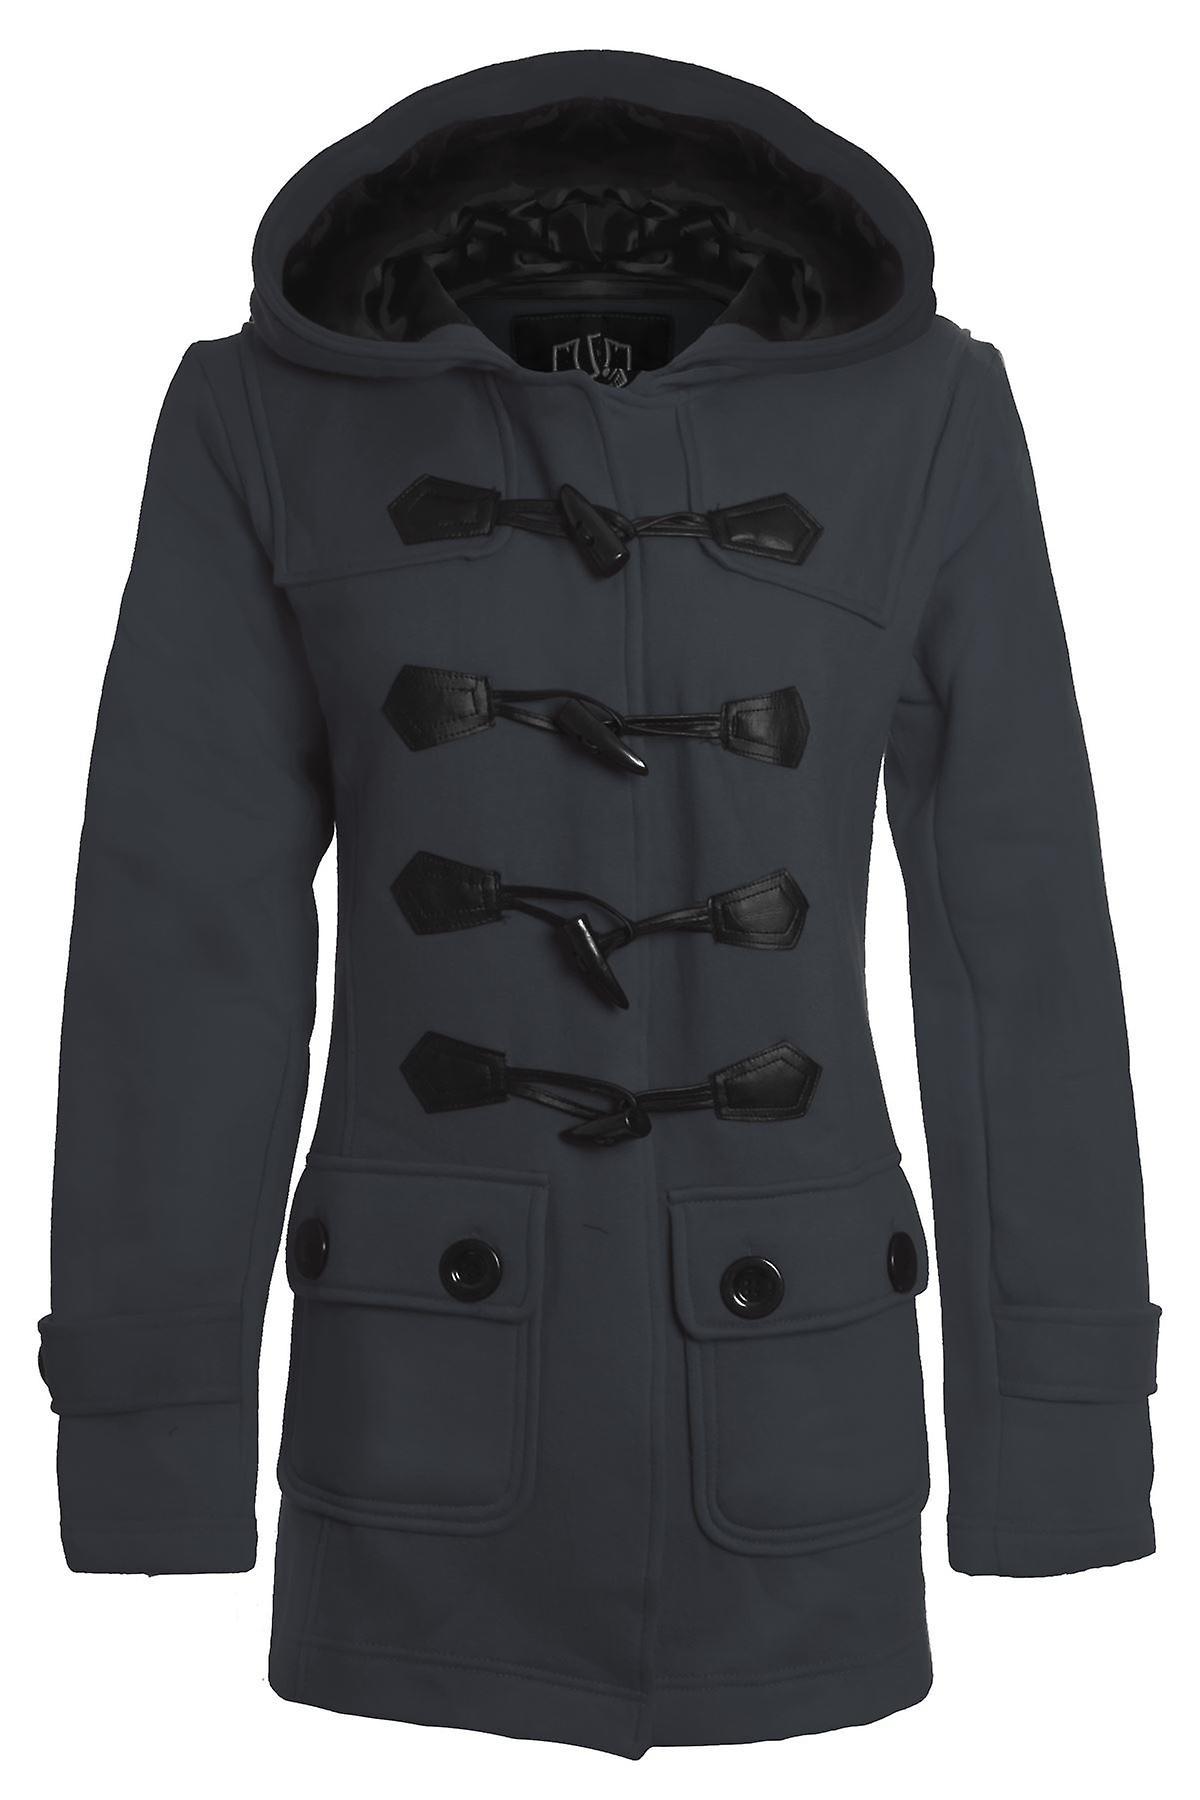 New Women's Duffle Trench Hooded Pocket Ladies Coat Jacket